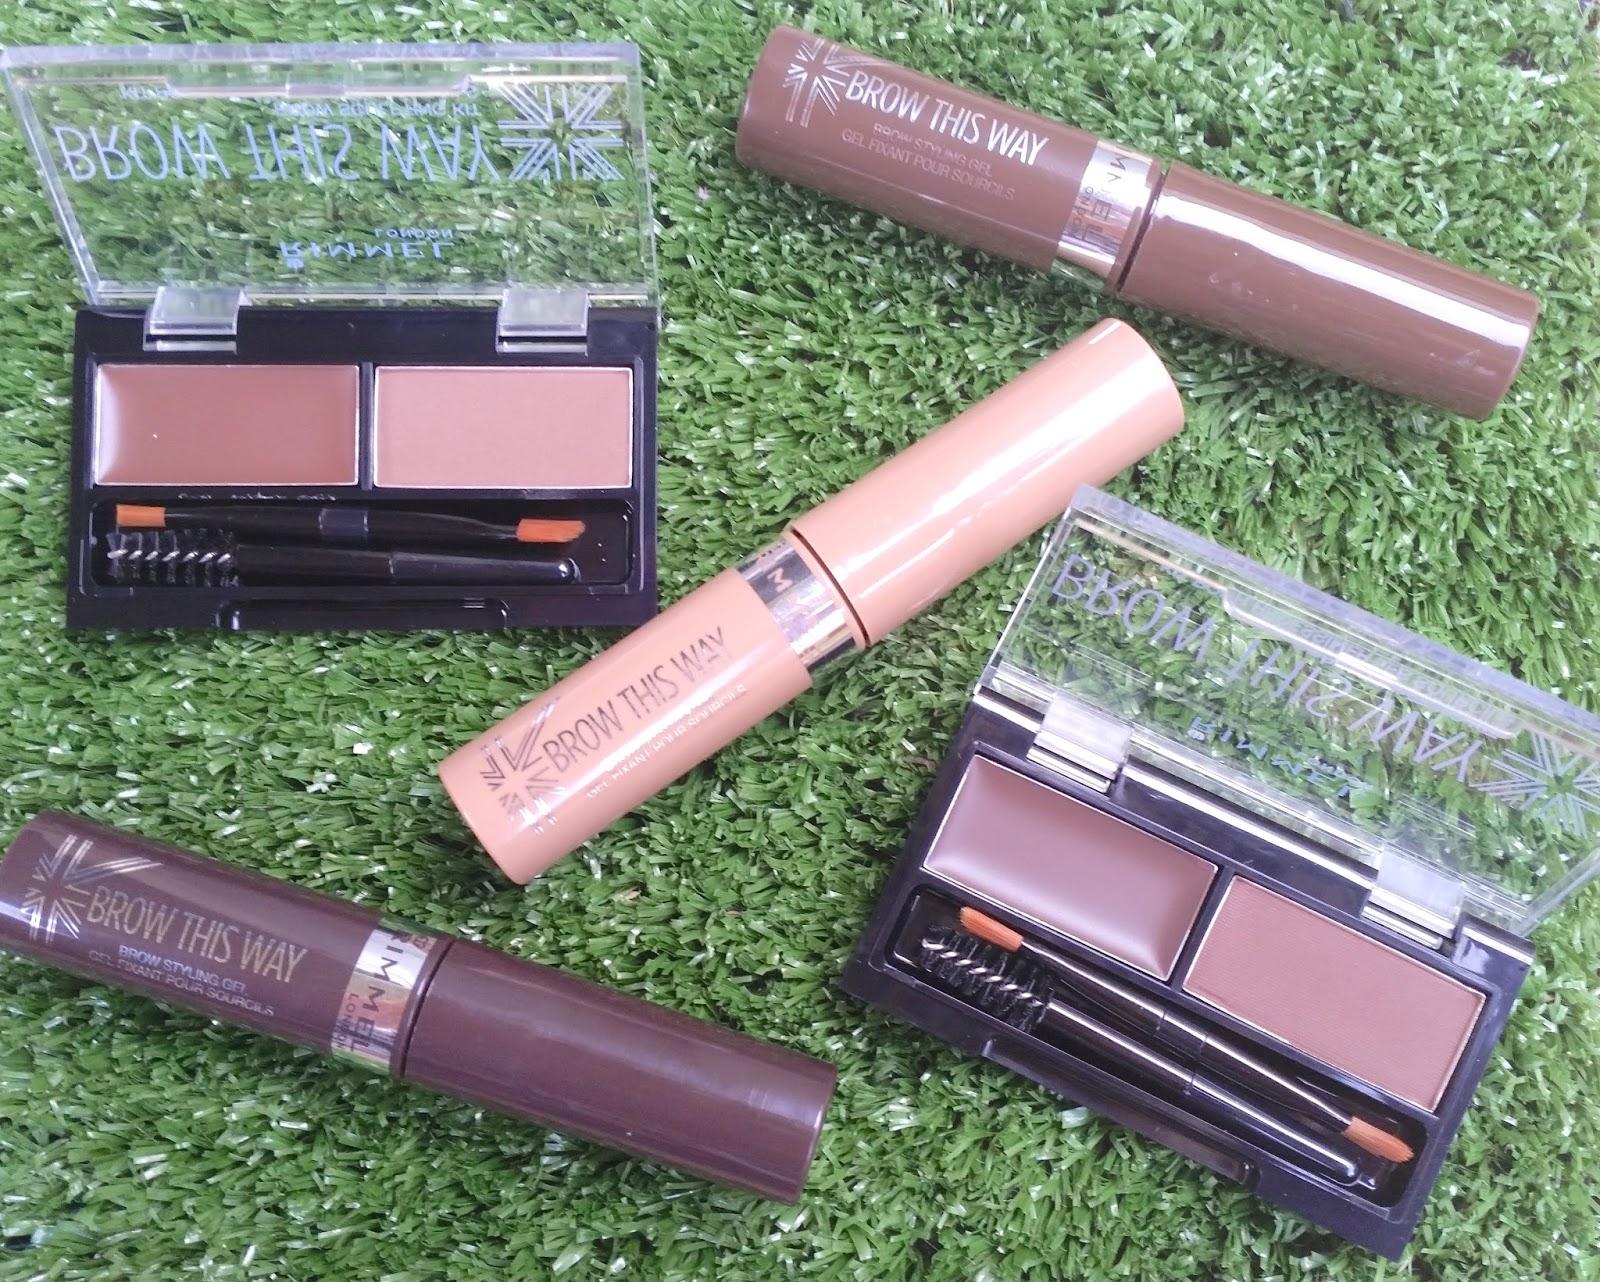 b261391246e Brow This Way Eyebrow Sculpting Kits! Shades – Mid Brown & Dark Brown. RRP  $12.95 (Shop!)